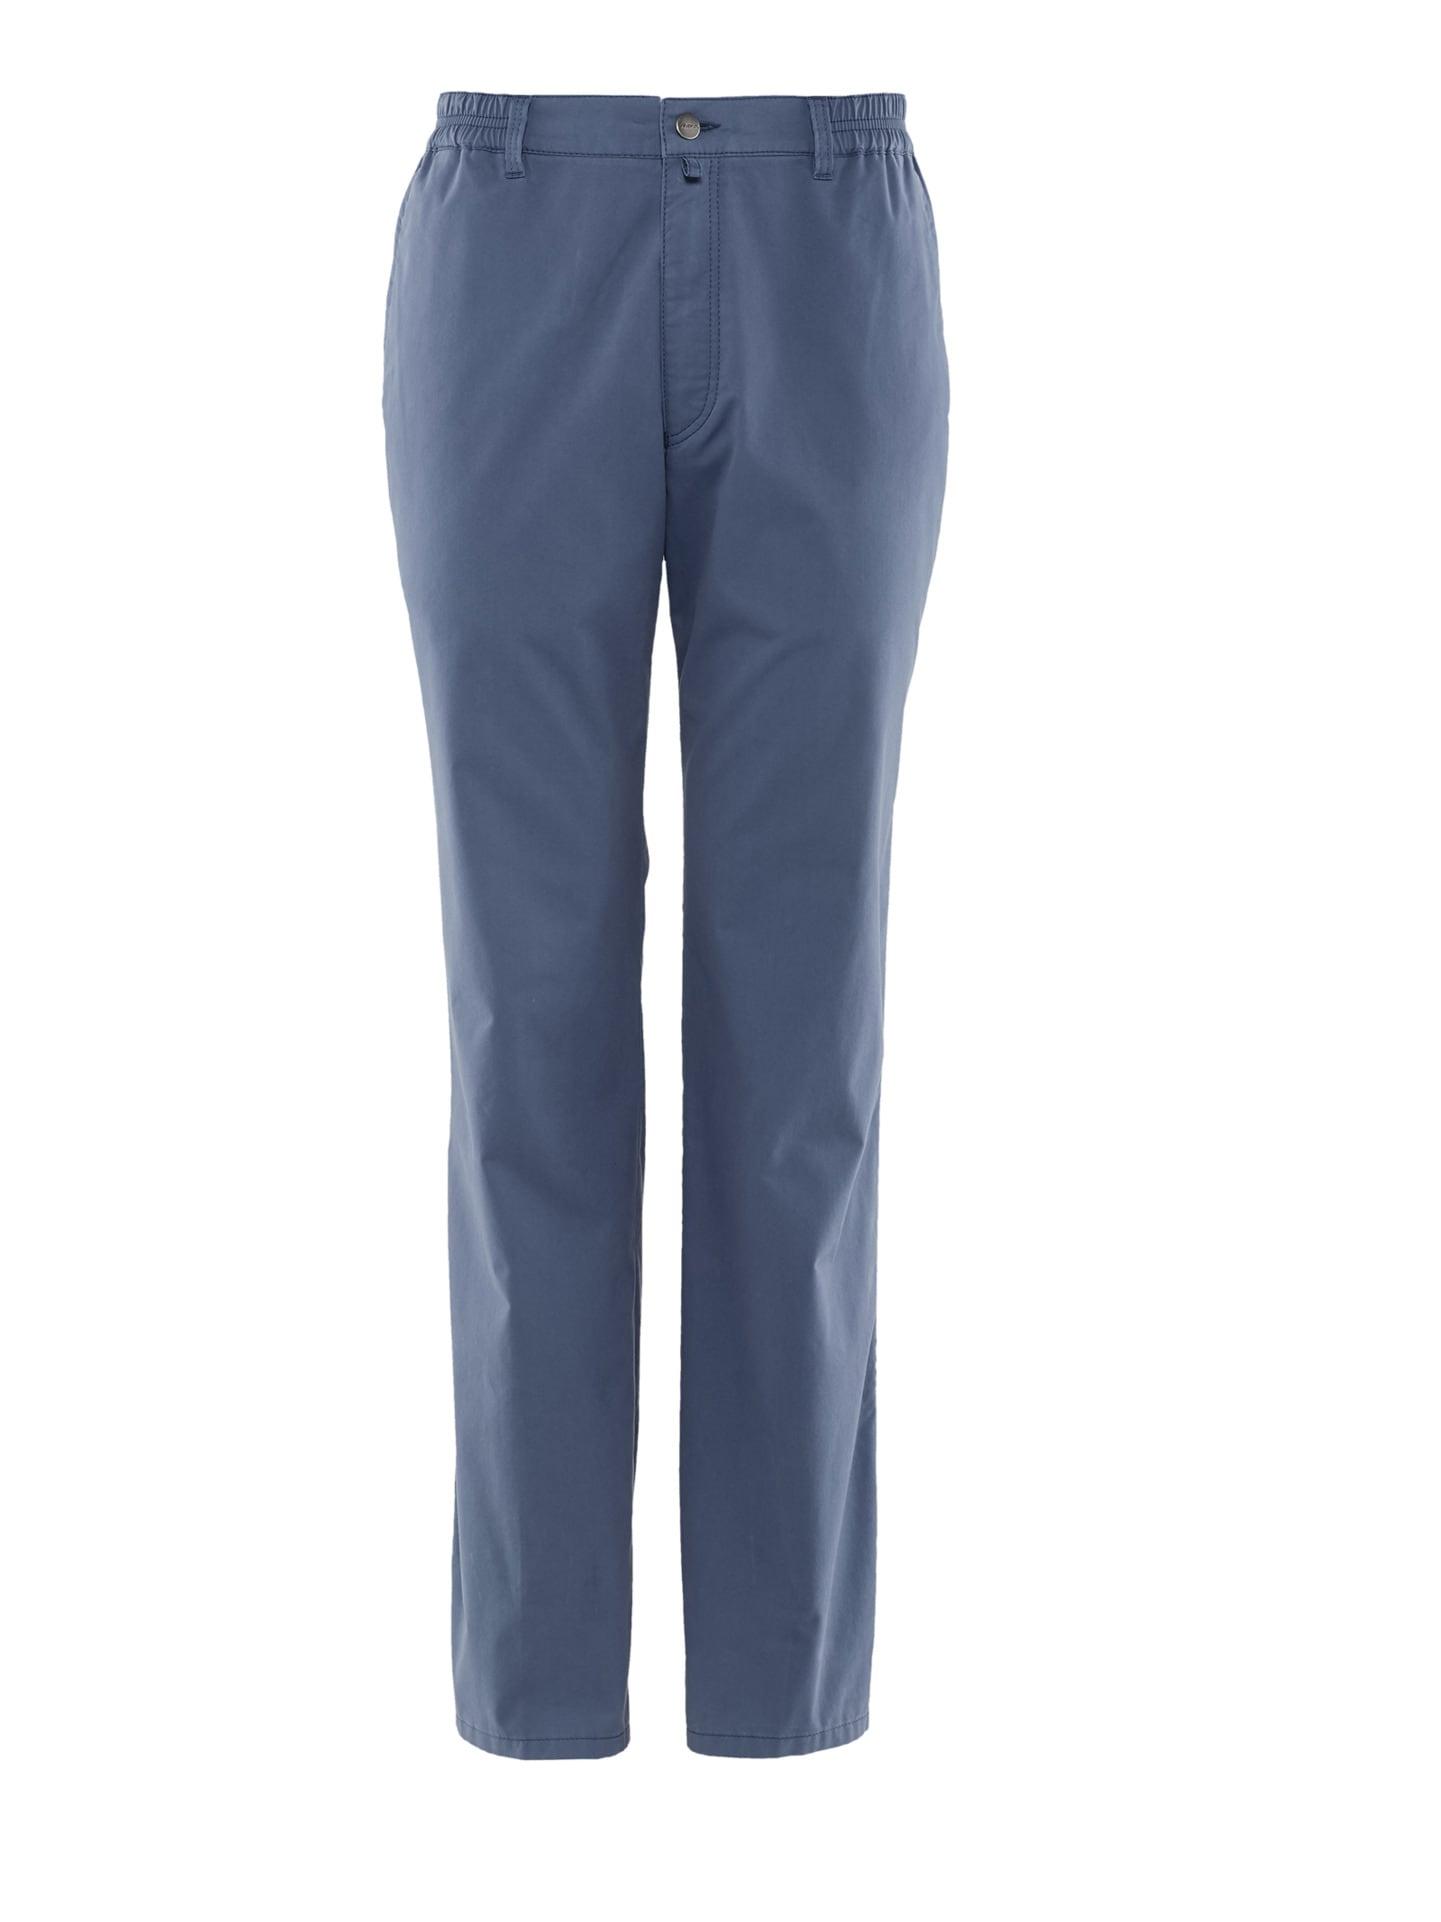 Avena Herren Klimasoft-Komfortbundhose Plus Blau 24-5240-5